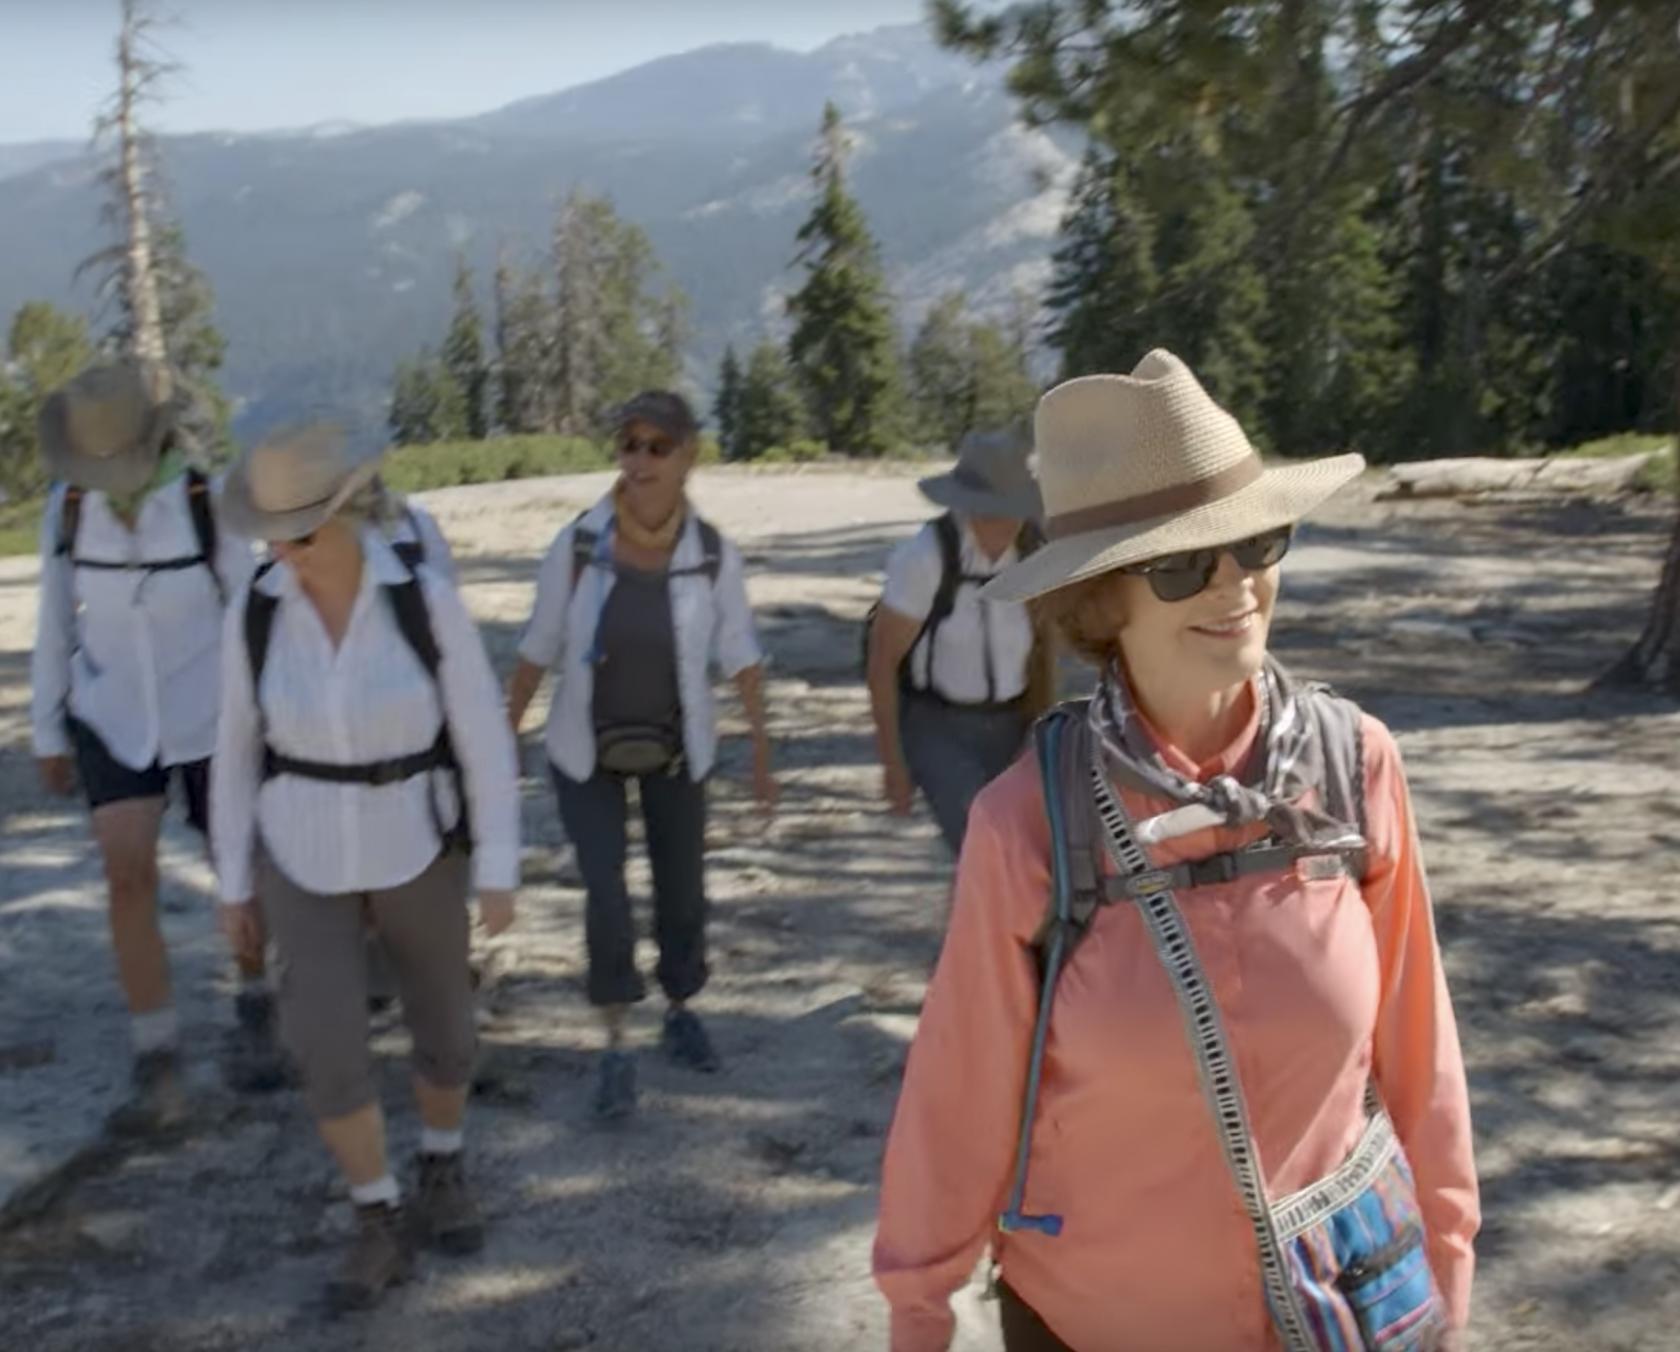 Mrs. Laura Bush walking through Yosemite National Park